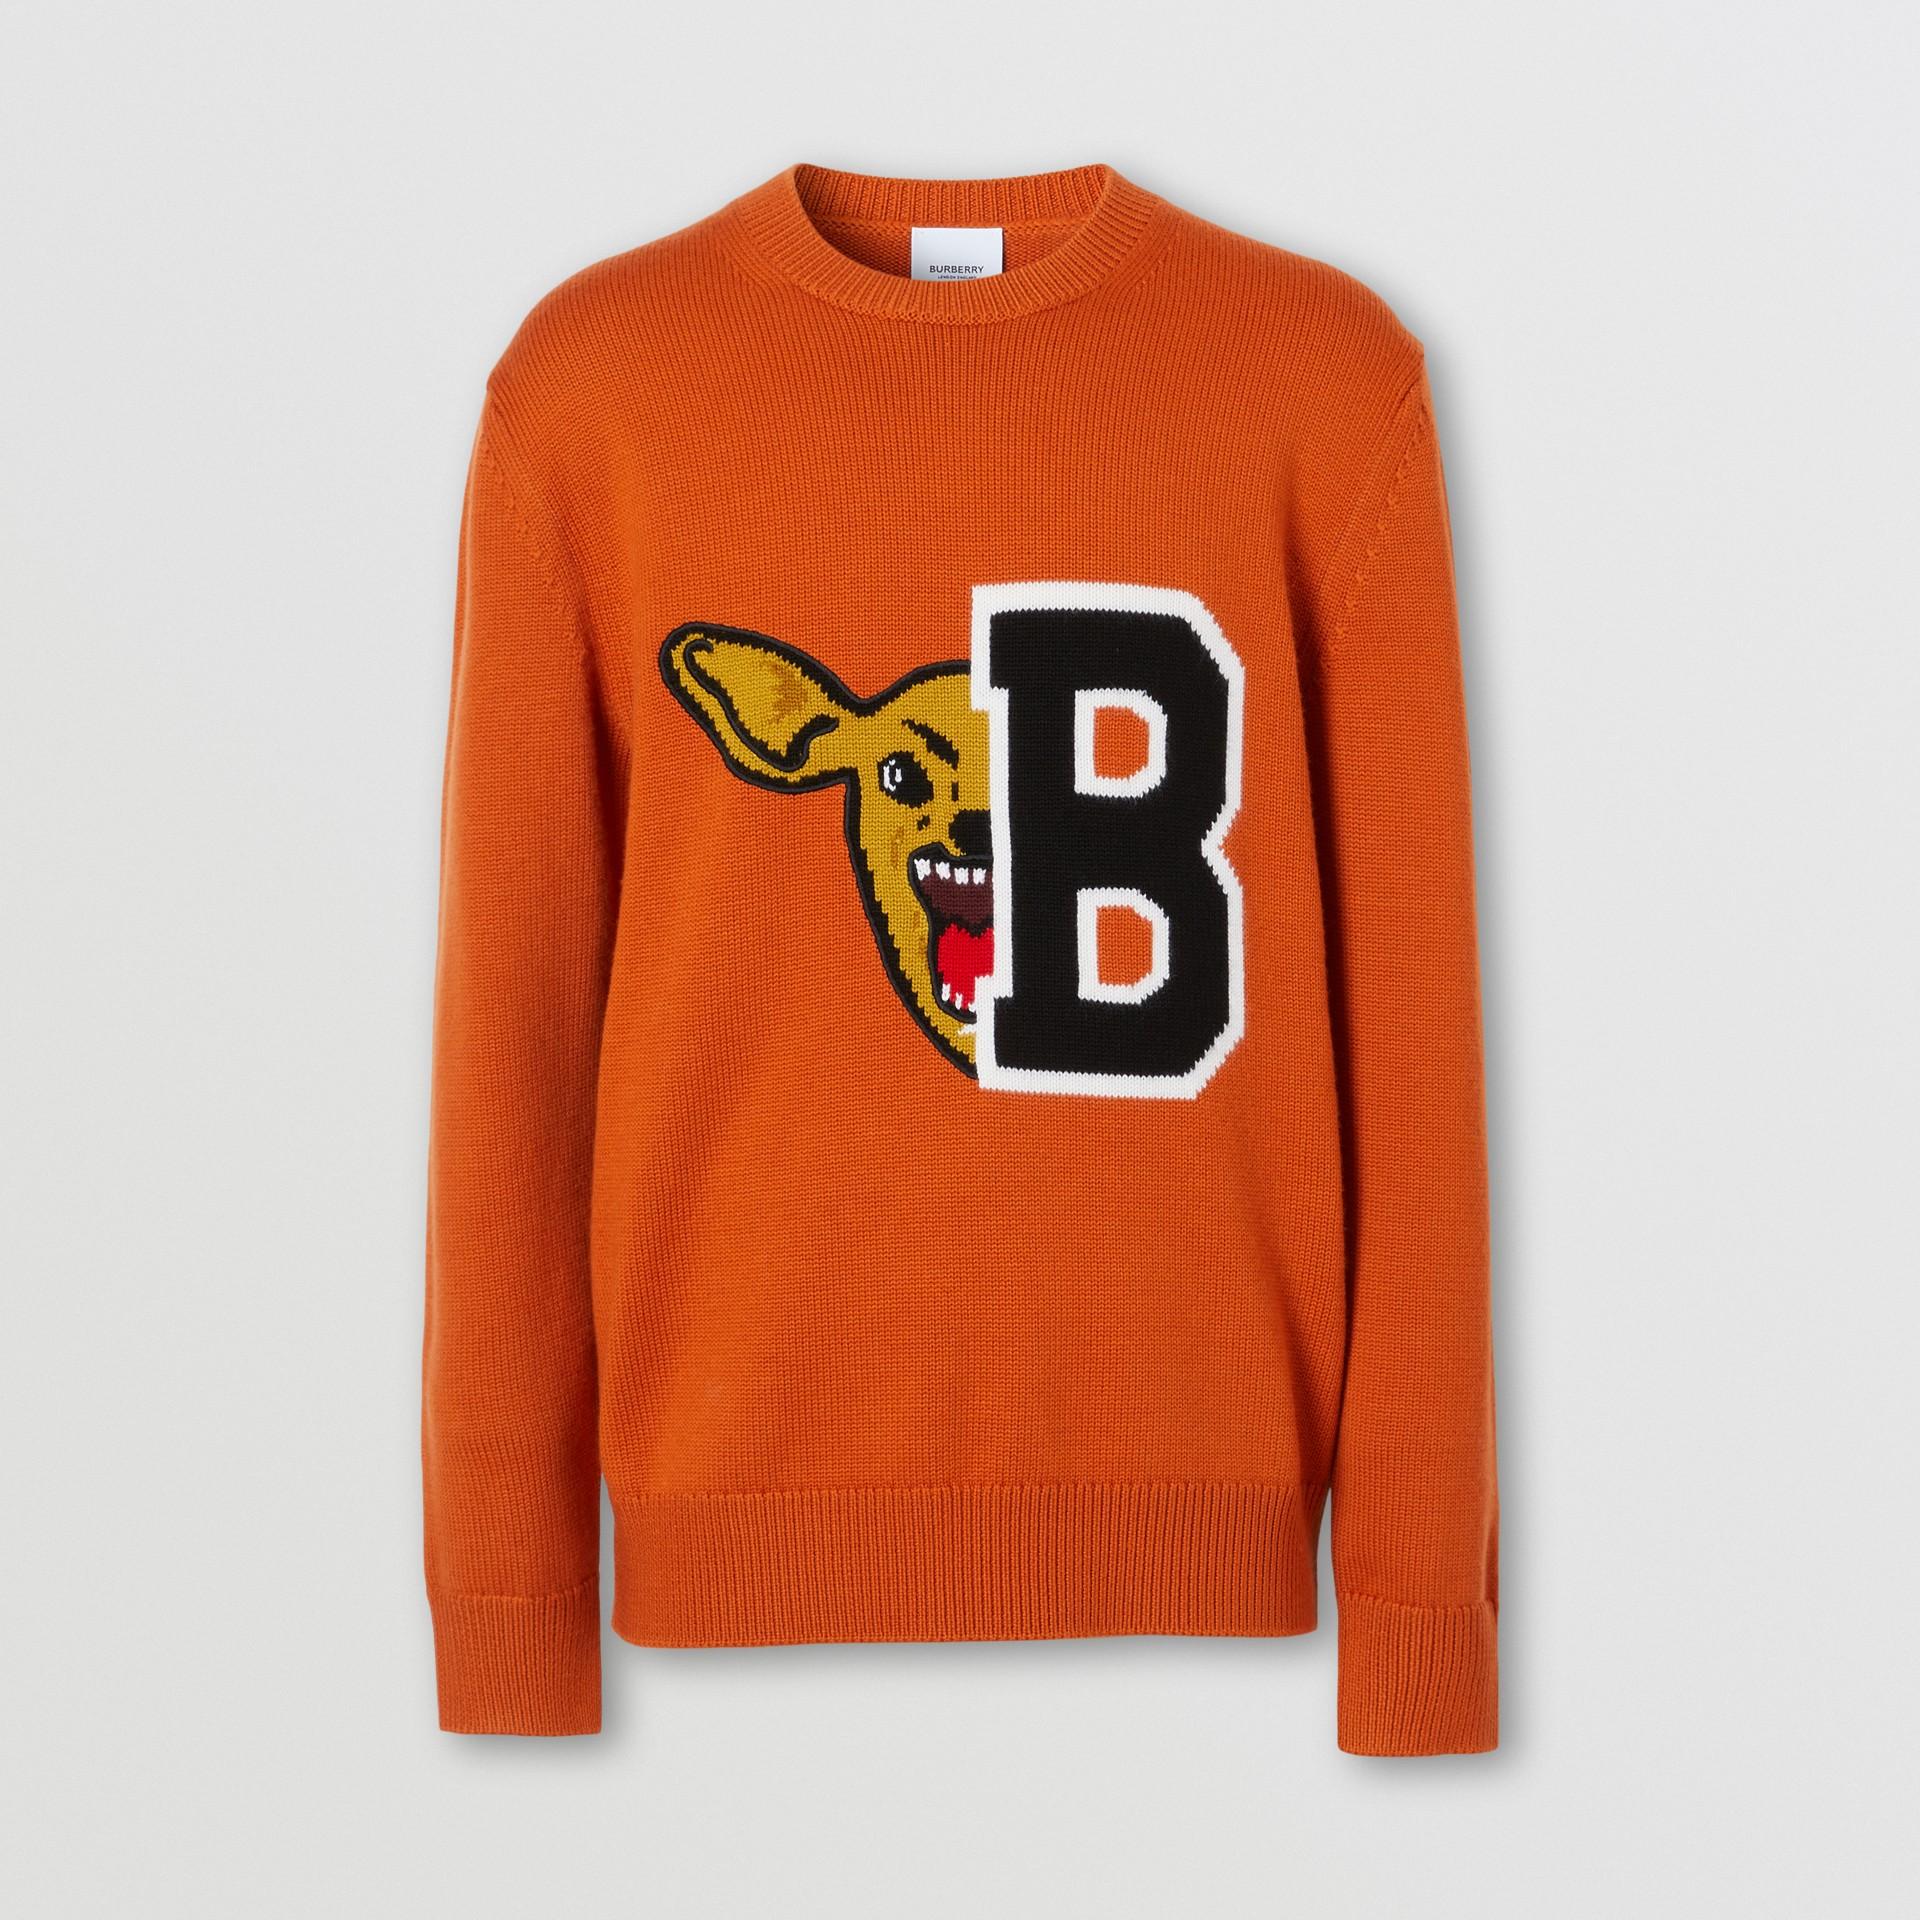 Varsity Graphic Merino Wool Jacquard Sweater in Burnt Orange - Men   Burberry - gallery image 3